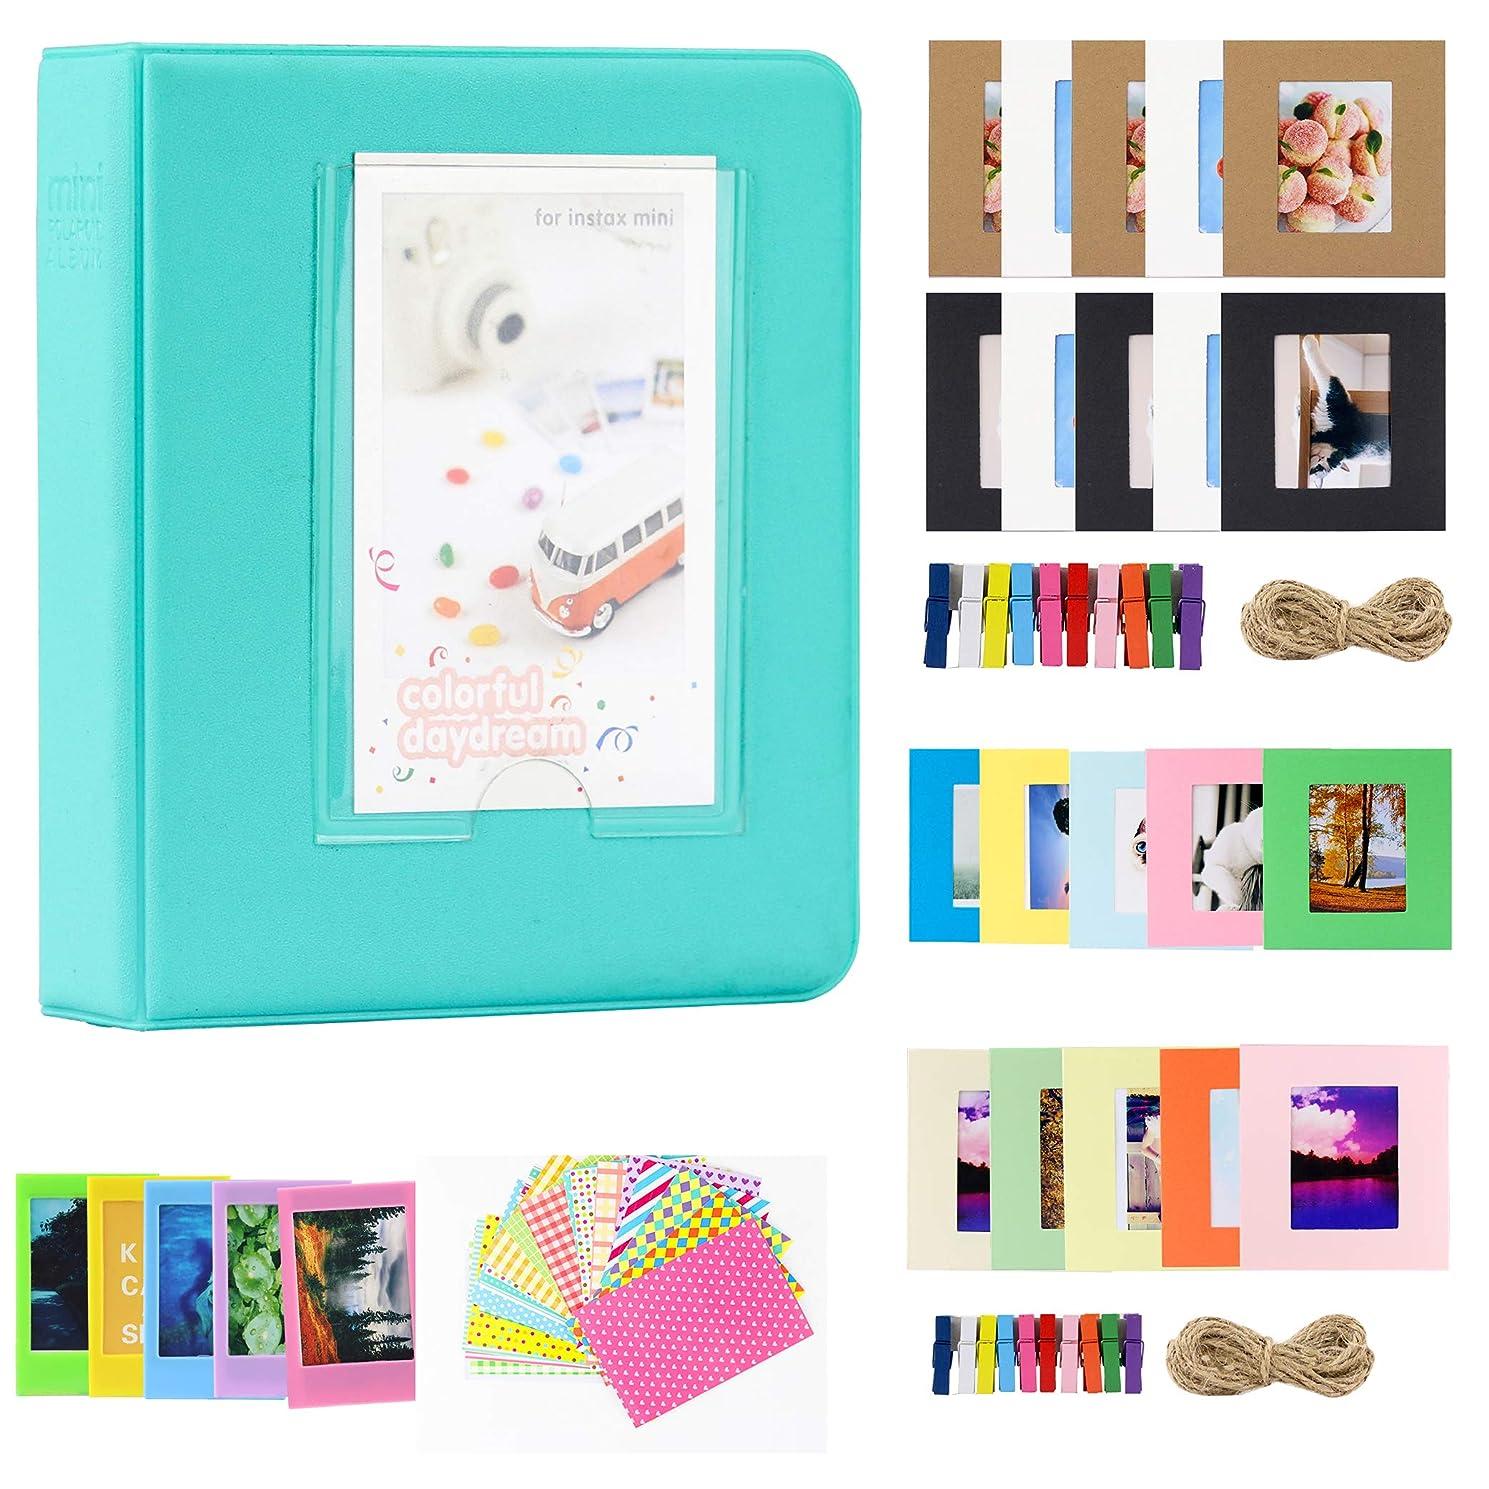 Brppo 2x3 Inch Photo Paper Film Album Set for Fujifilm Instax Mini Camera/HP Sprocket Photo Printer/Polaroid Snap, Z2300 & SocialMatic Instant Cameras (64 Pockets, Mint)